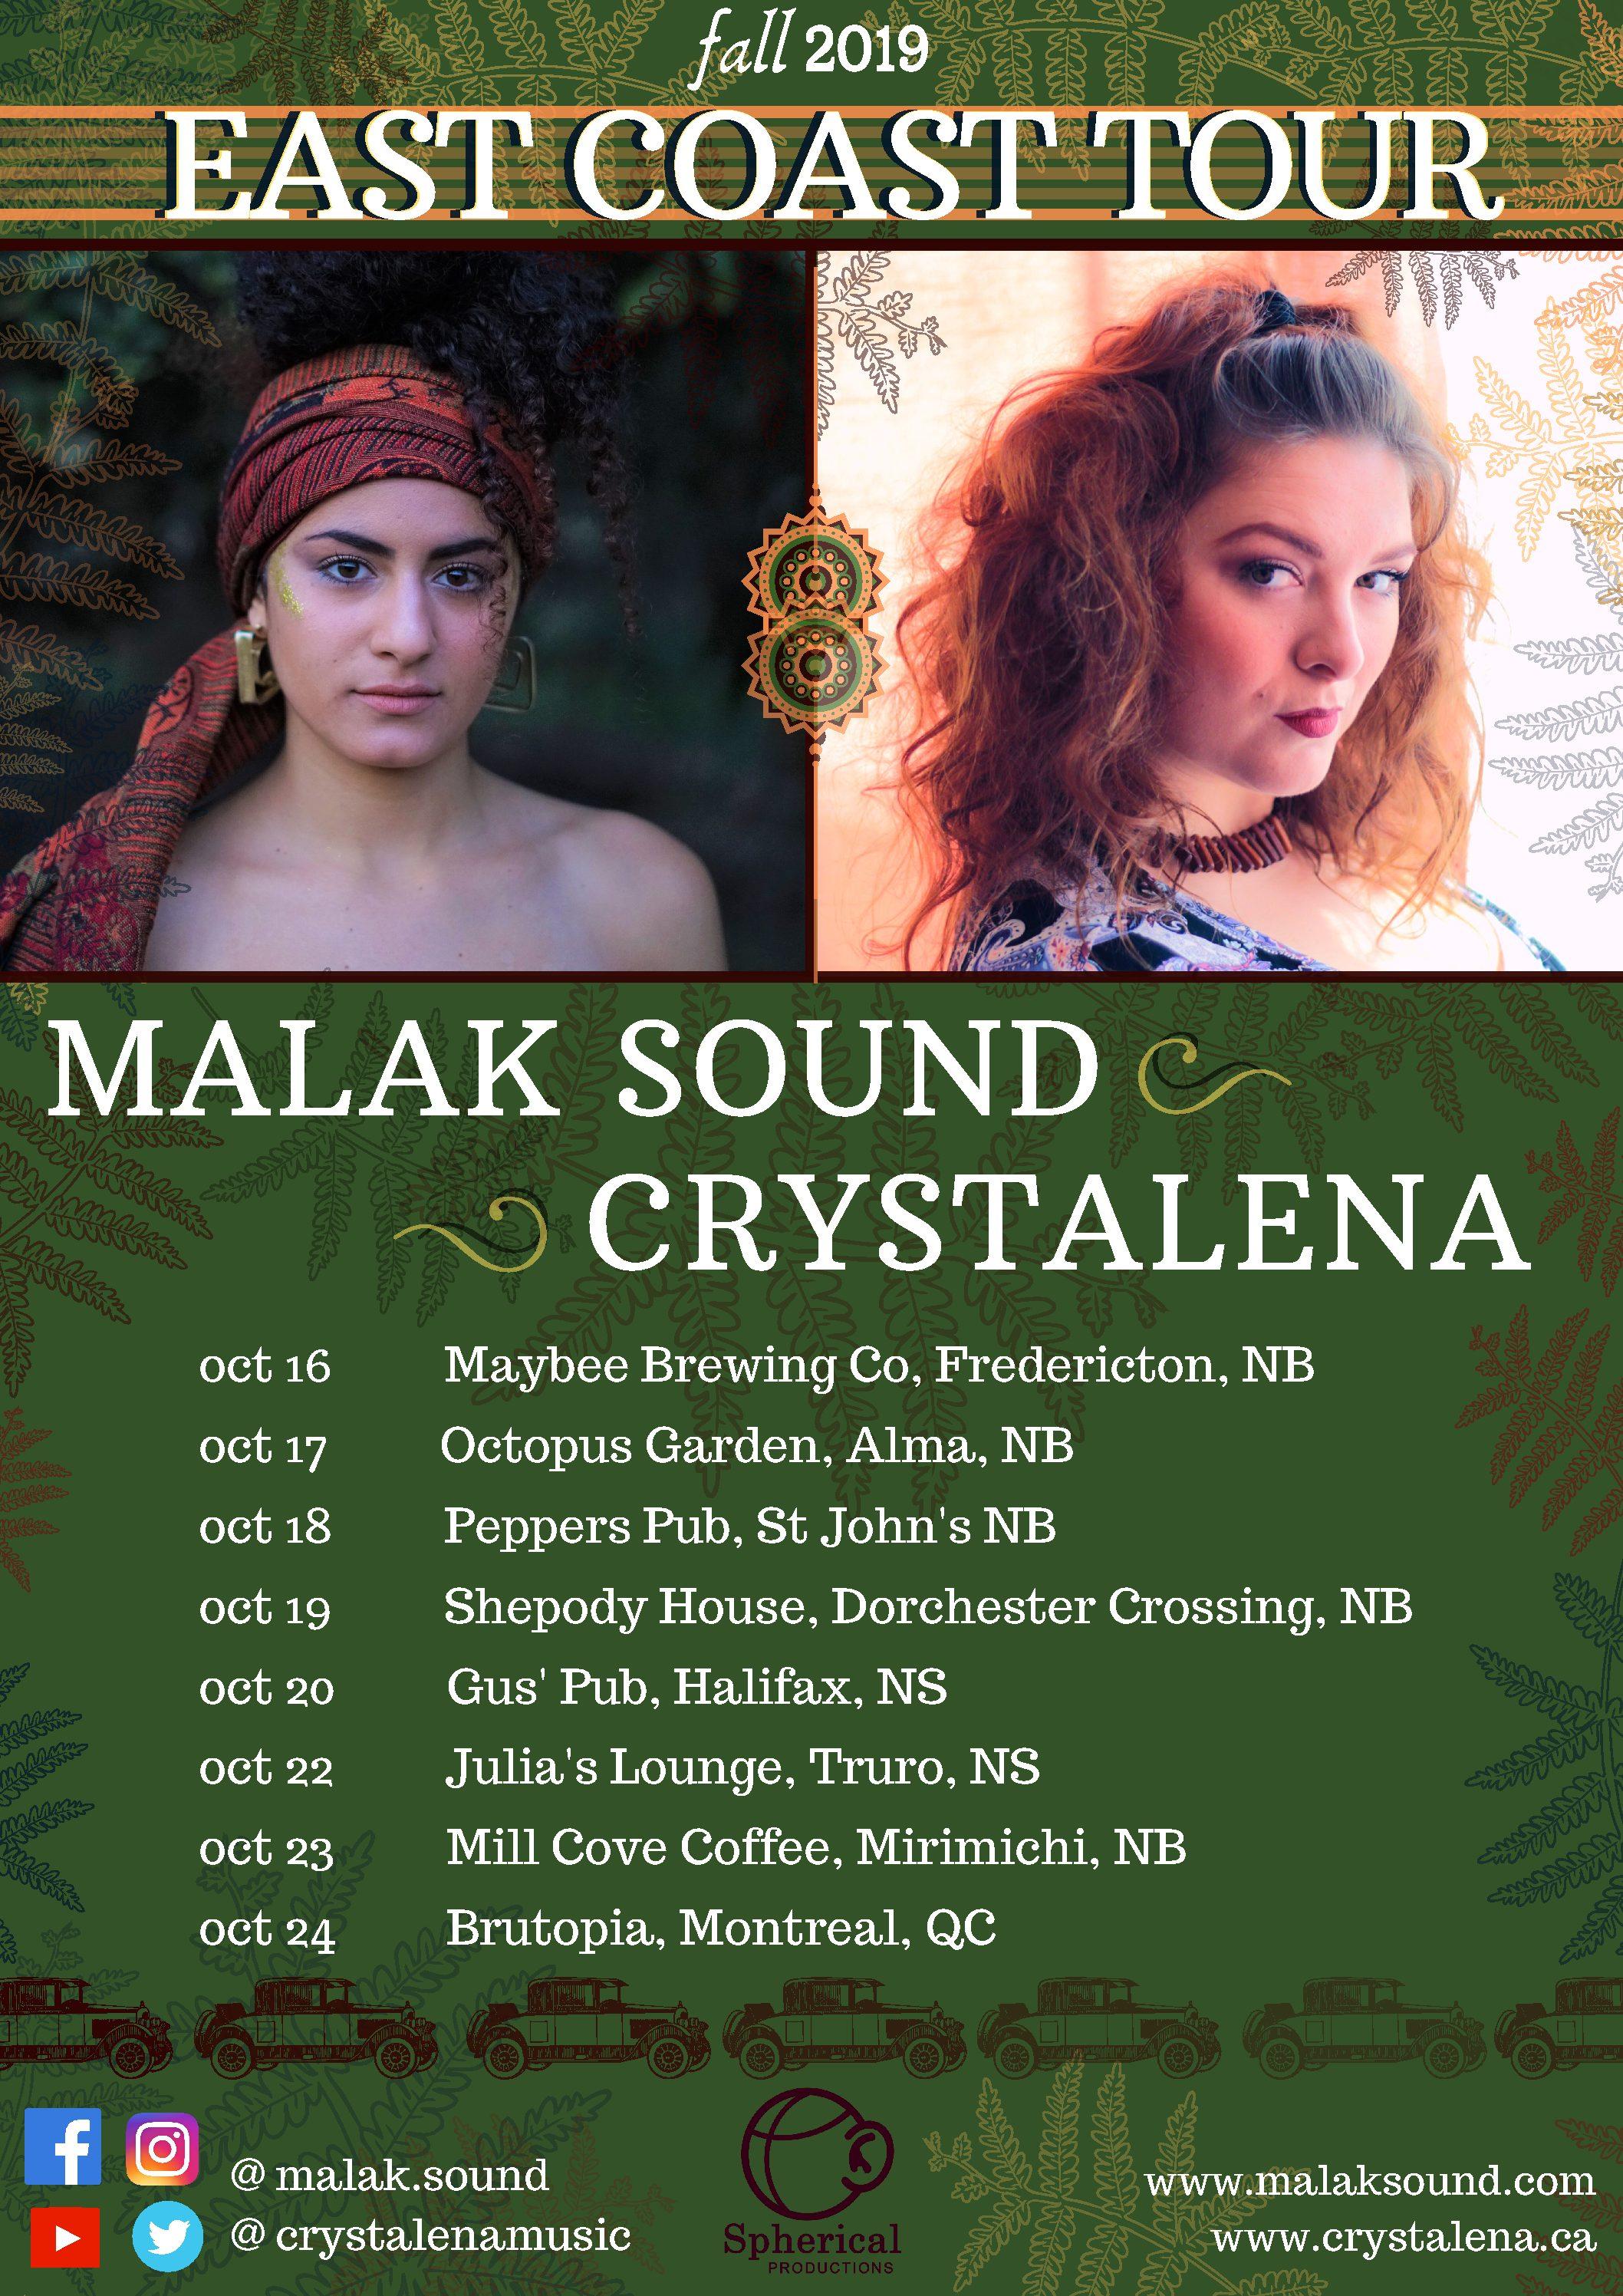 Malak Sound + Crystalena + Kylie Fox